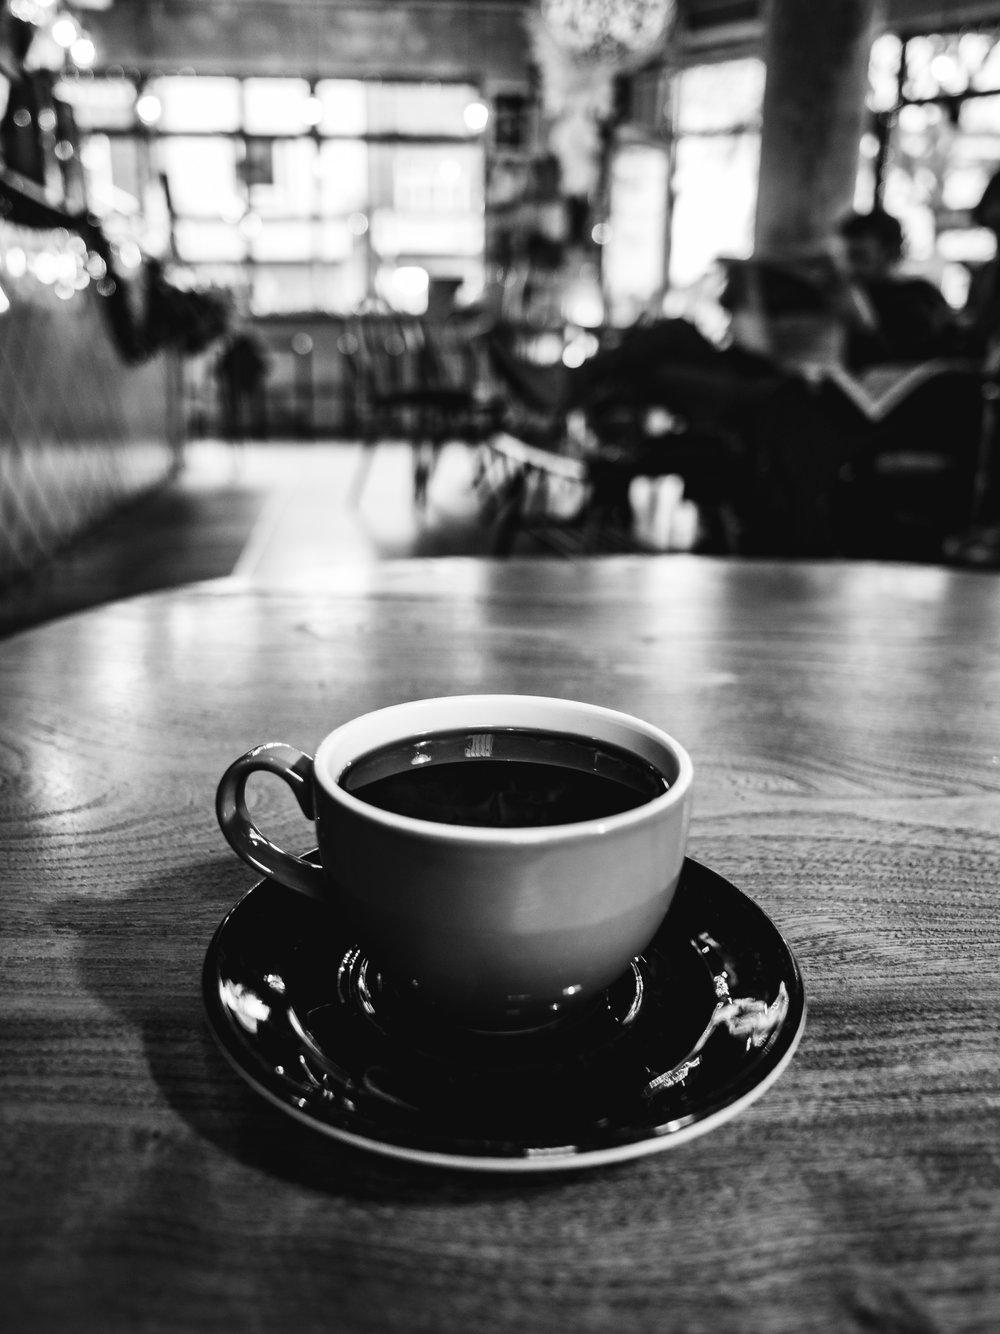 Coffee Filter Black Cafe Shop